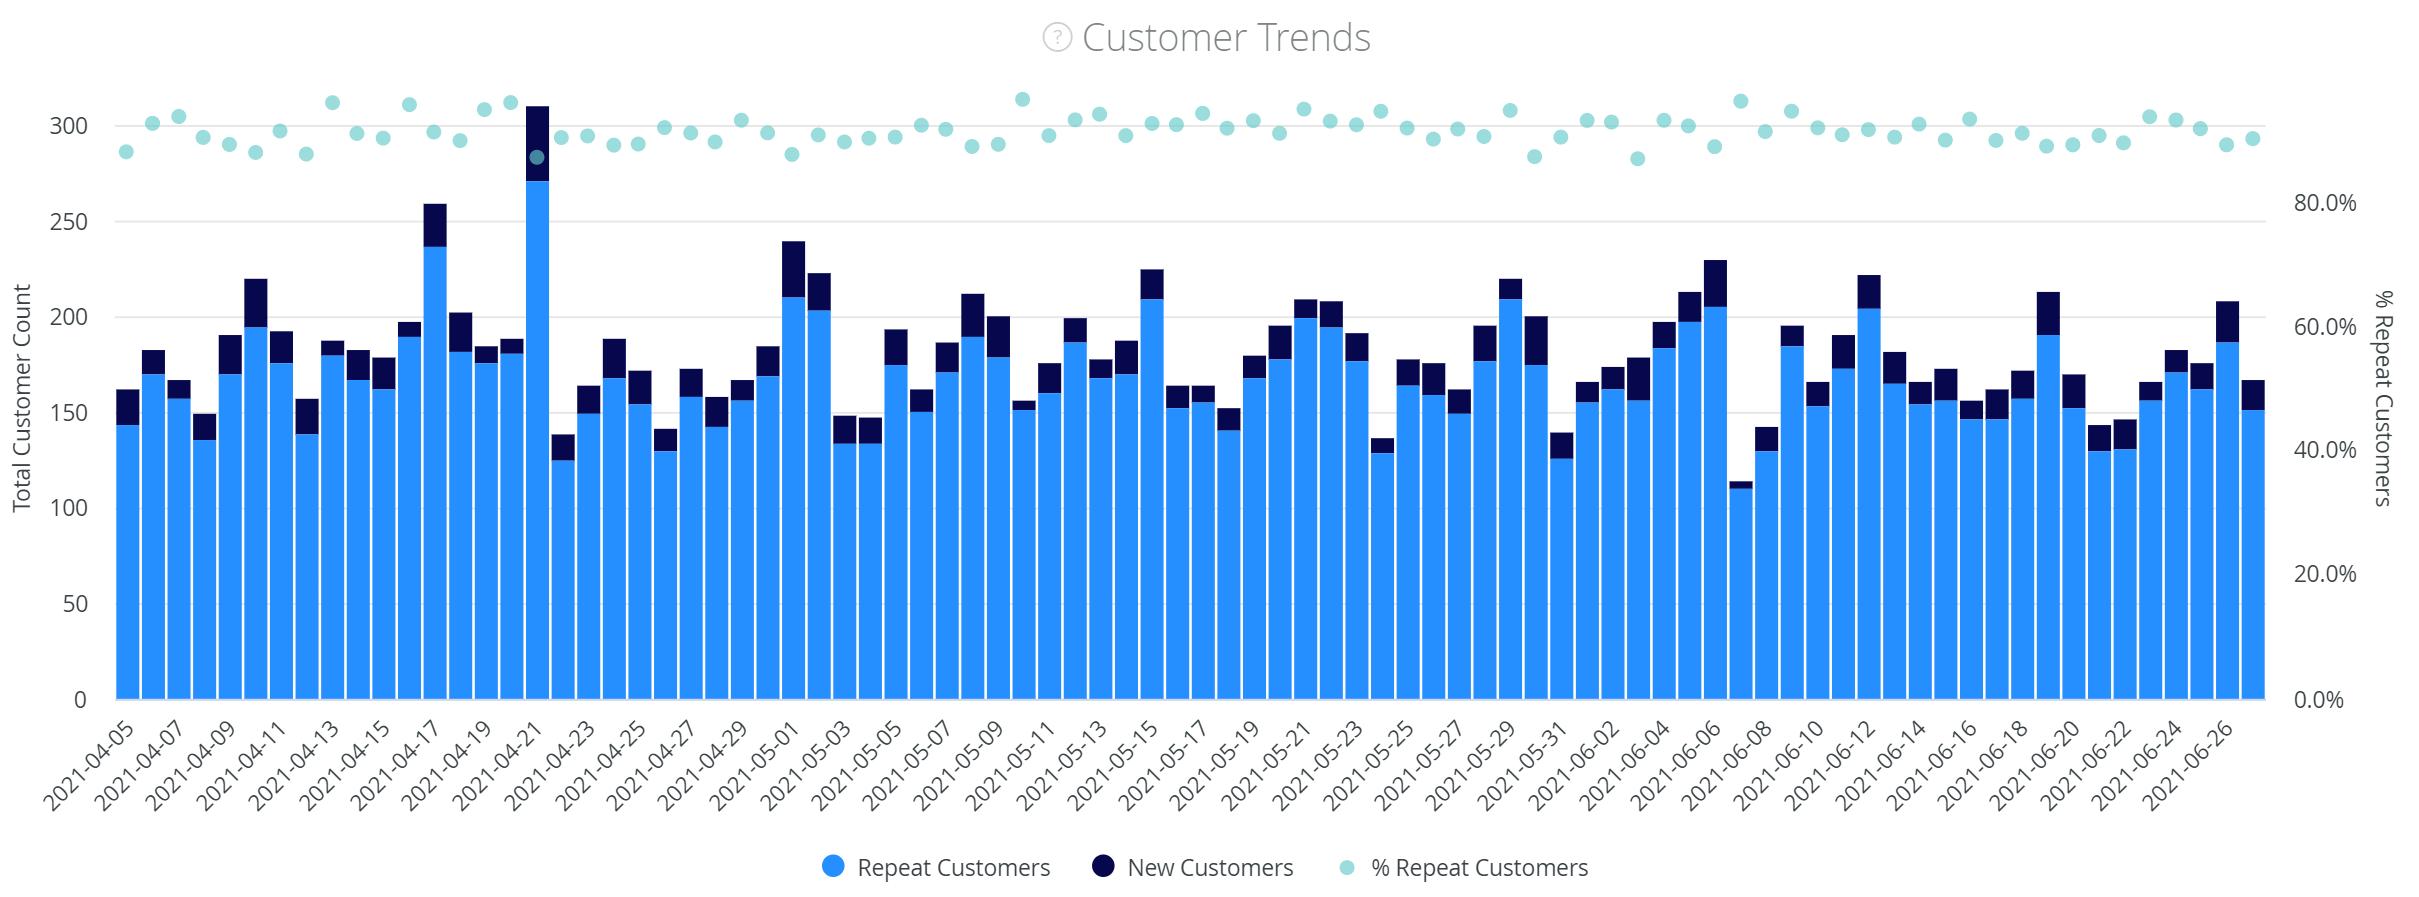 Customer retention report: customer trends graph